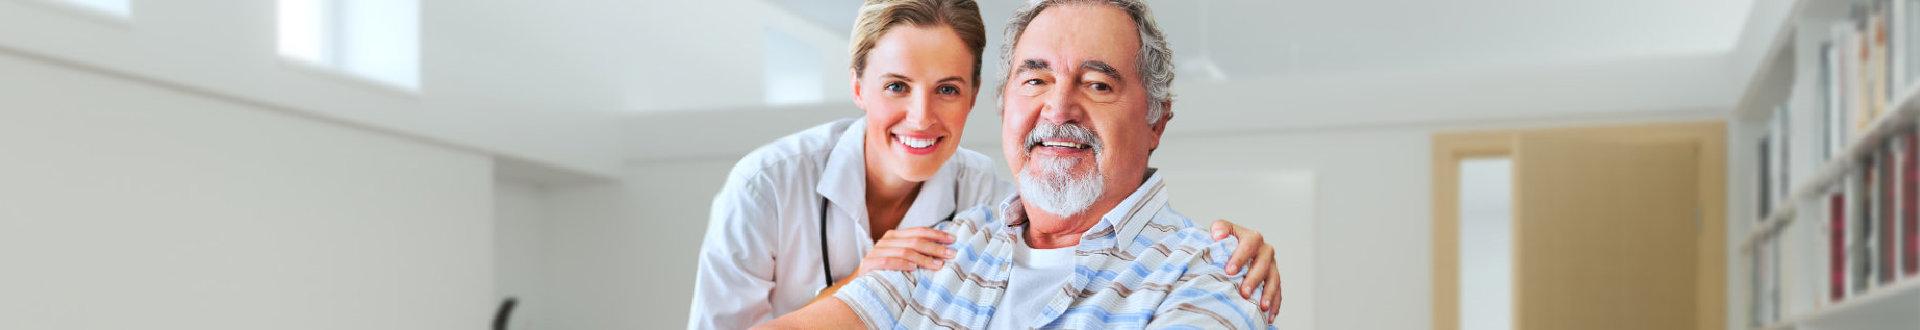 senior man and his caregiver smiling